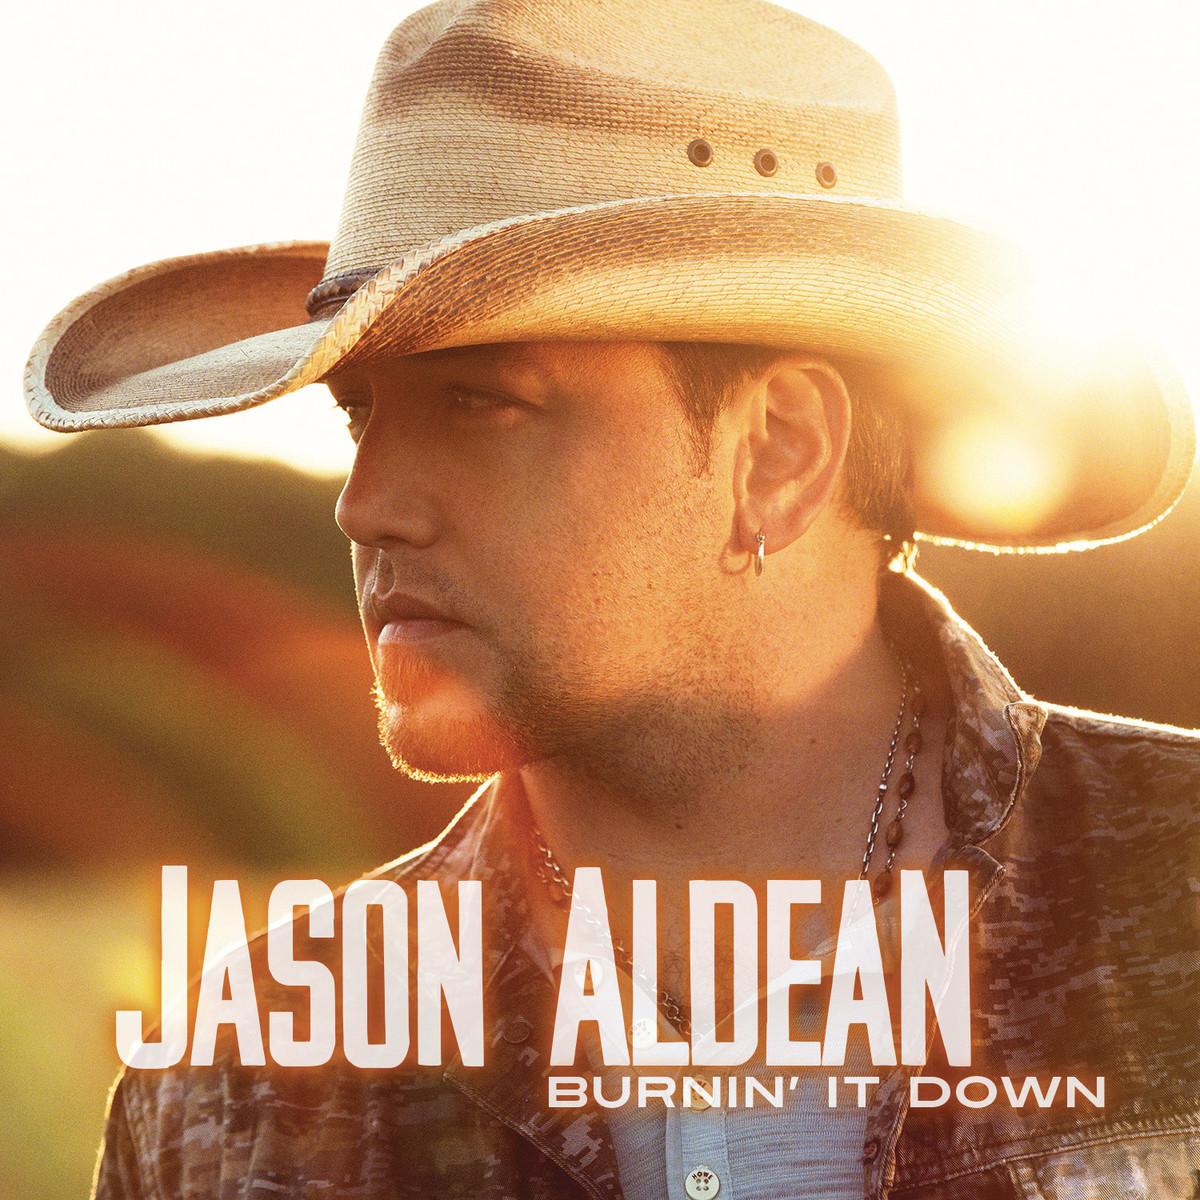 Jason-Aldean-Burnin-It-Down-2014-1200x1200